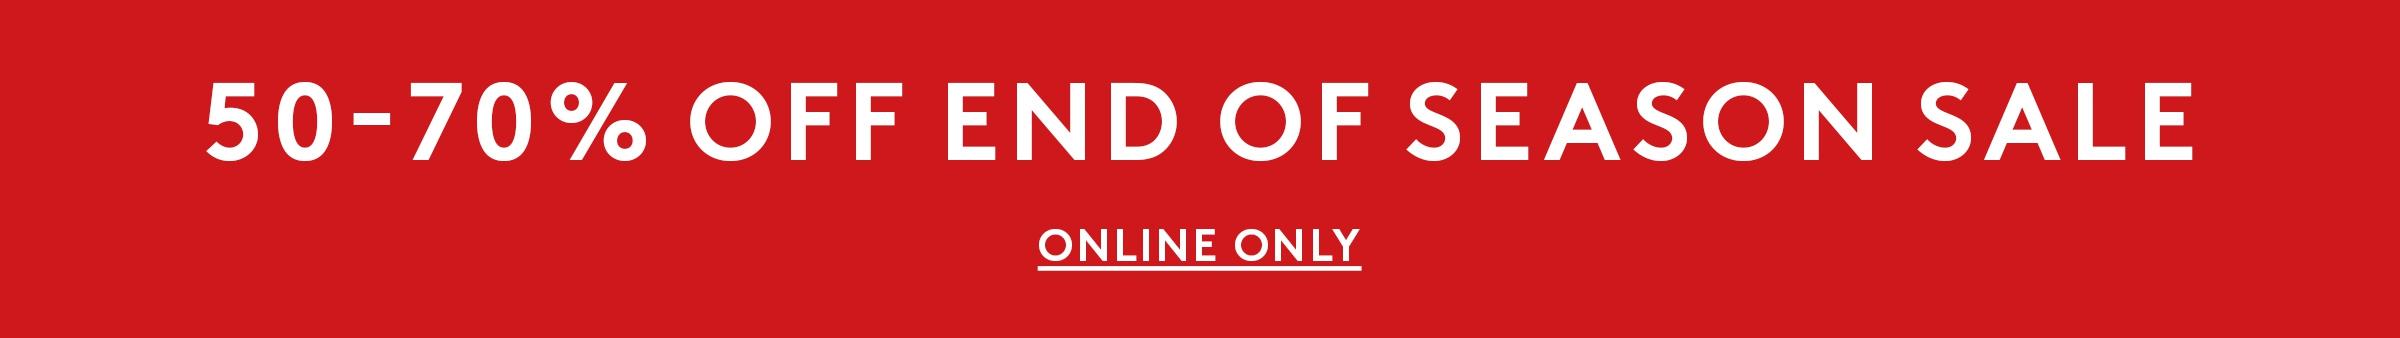 50-70% Off End Of Season Sale